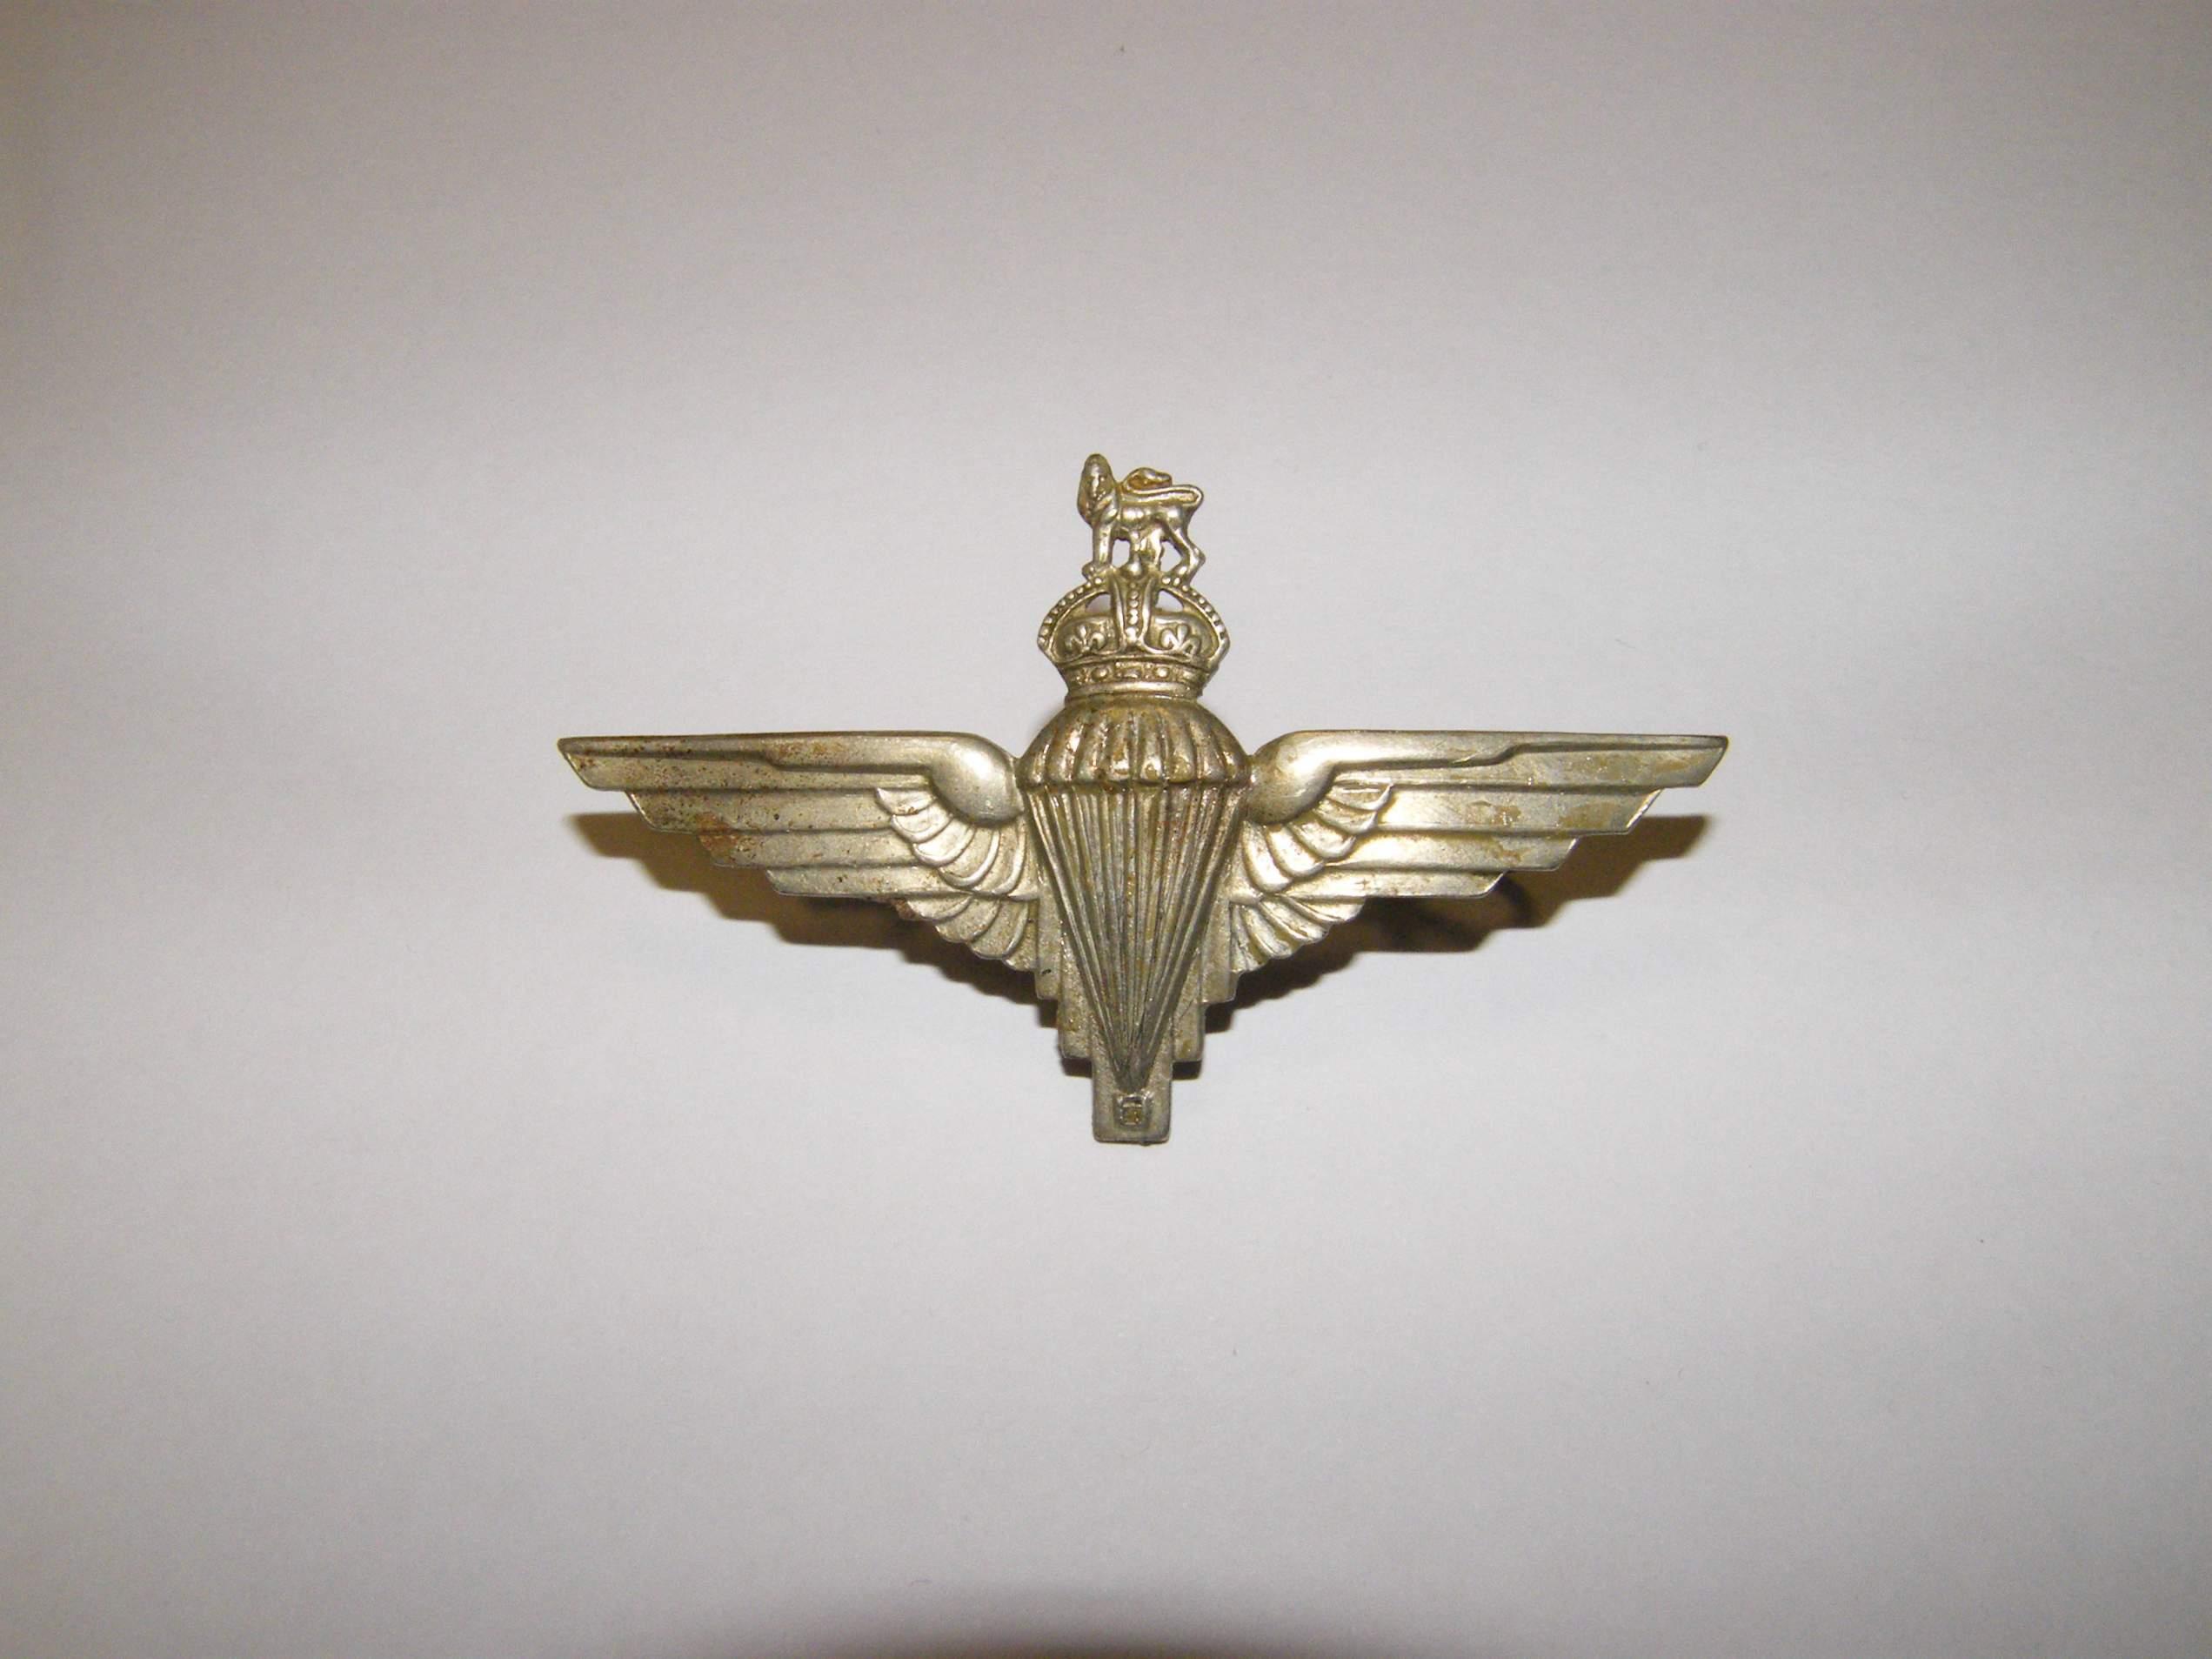 Para regiment cap badge clarification